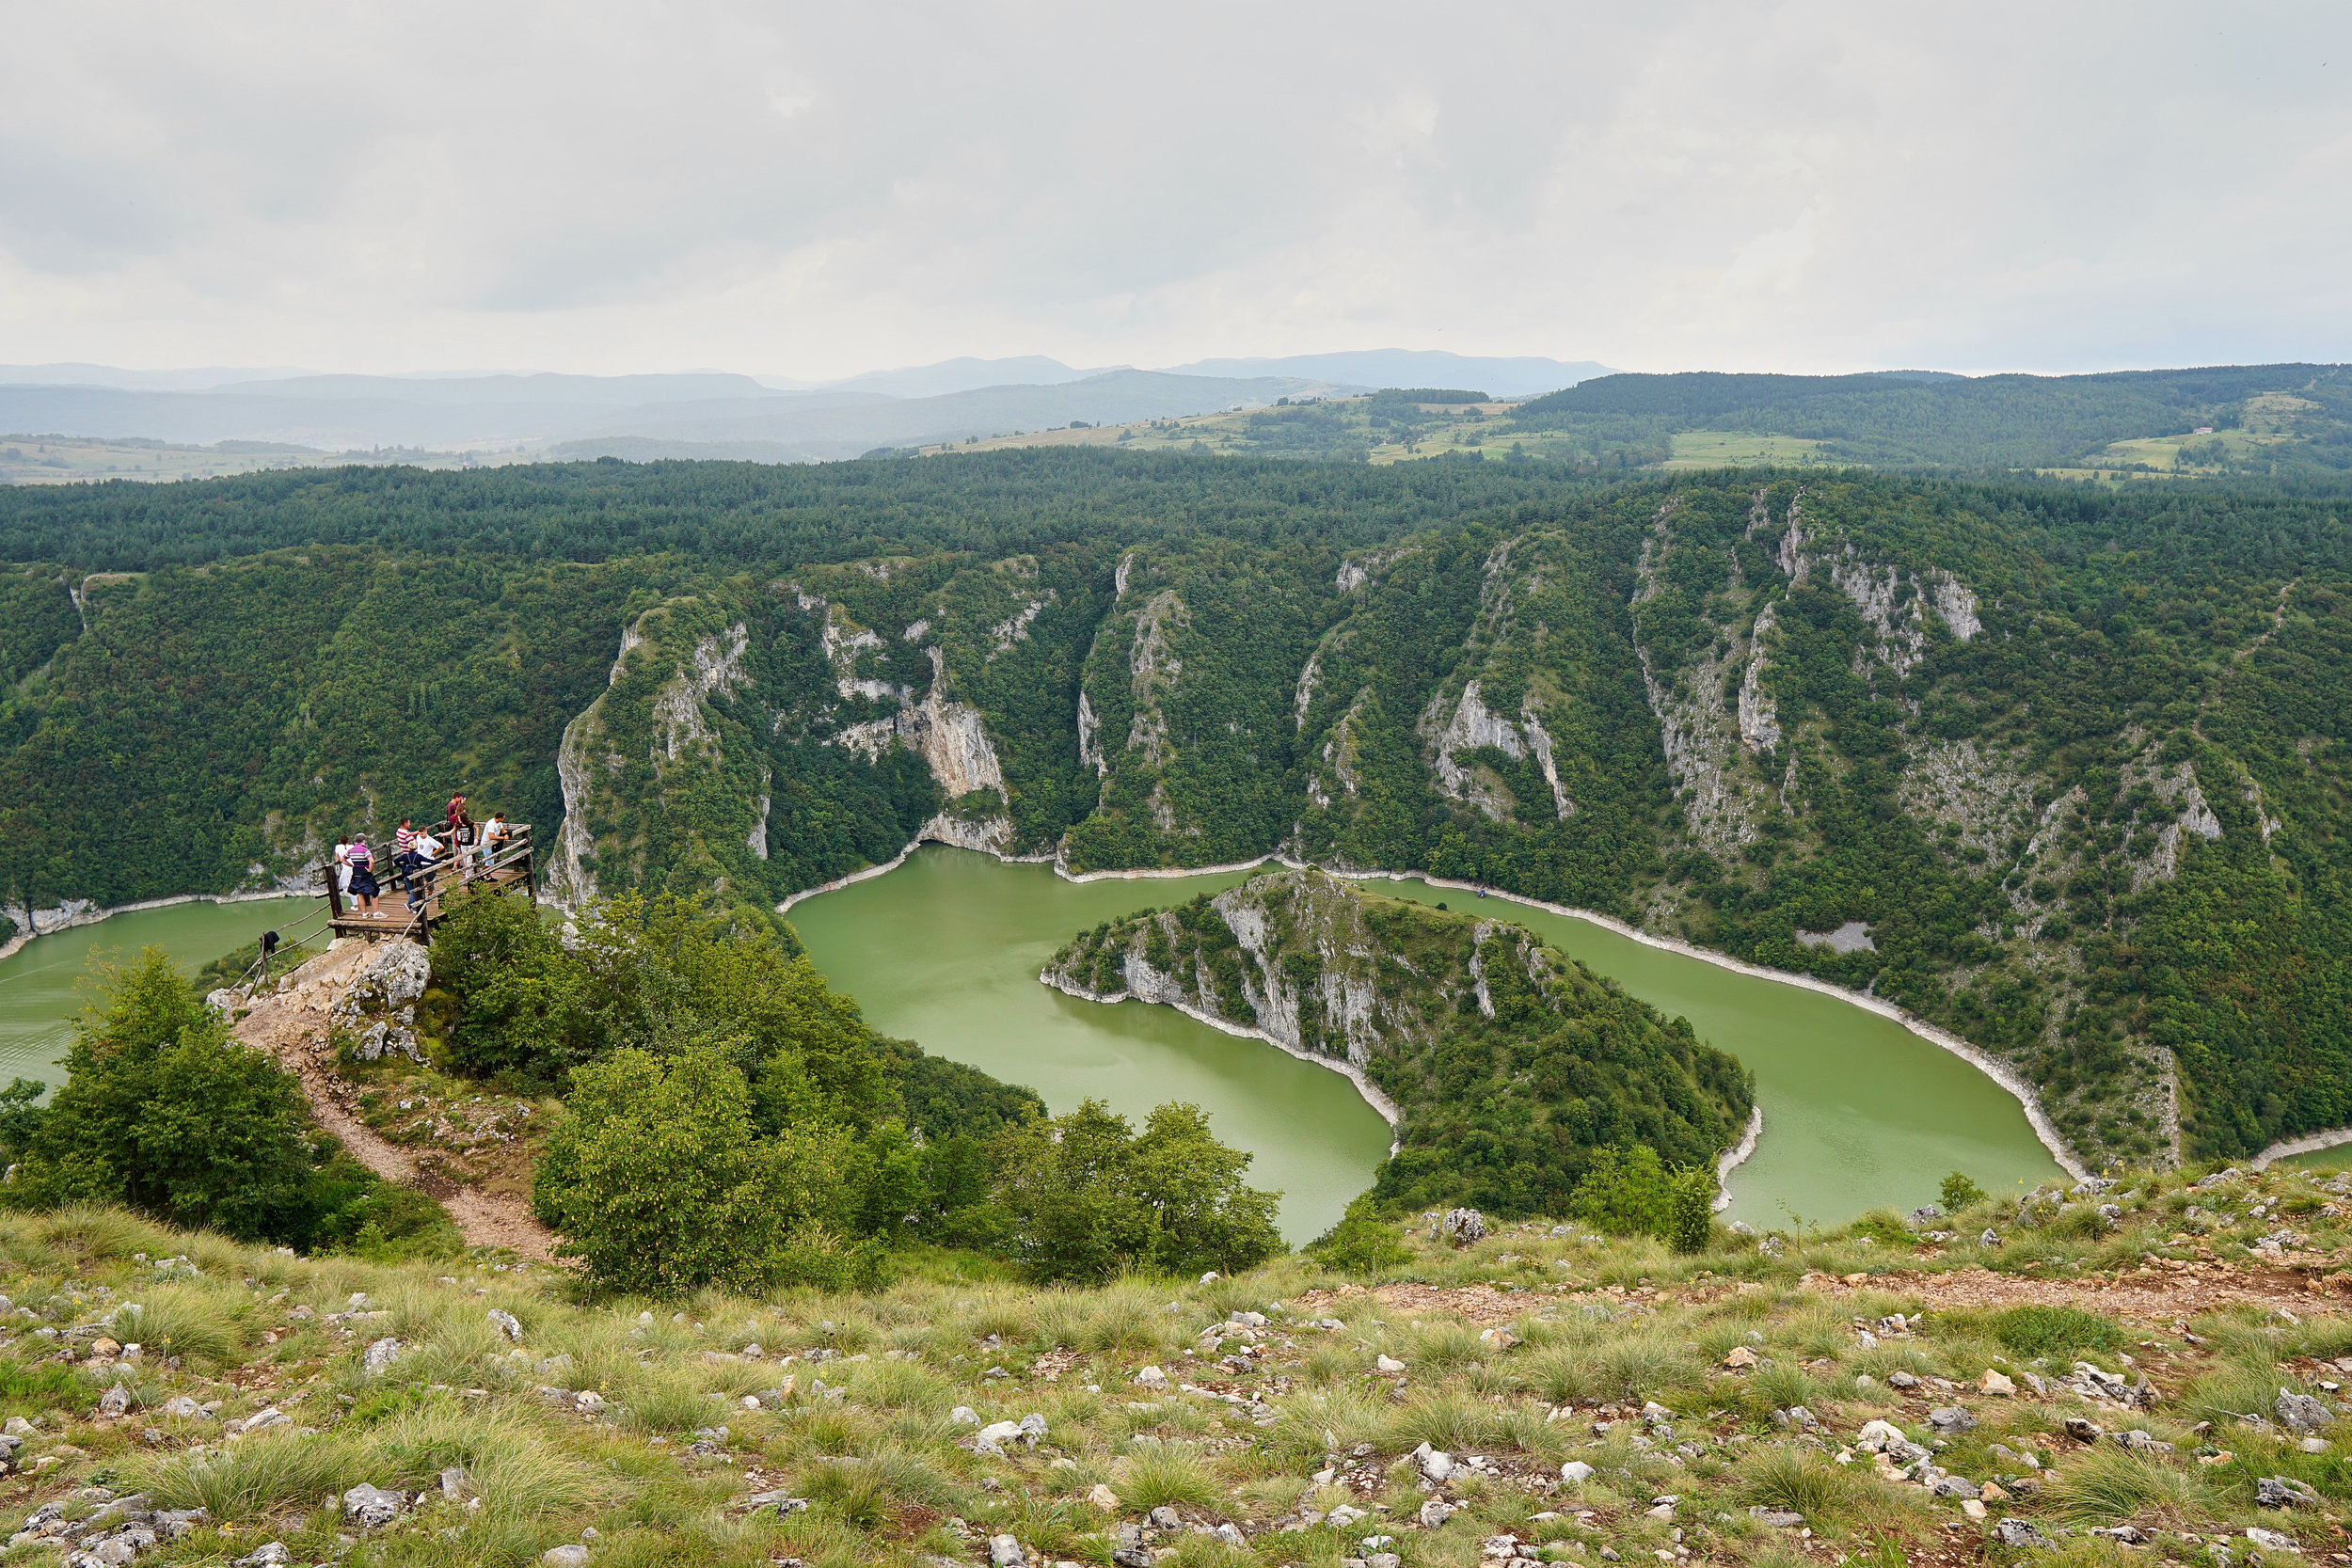 uvac river 4.jpg